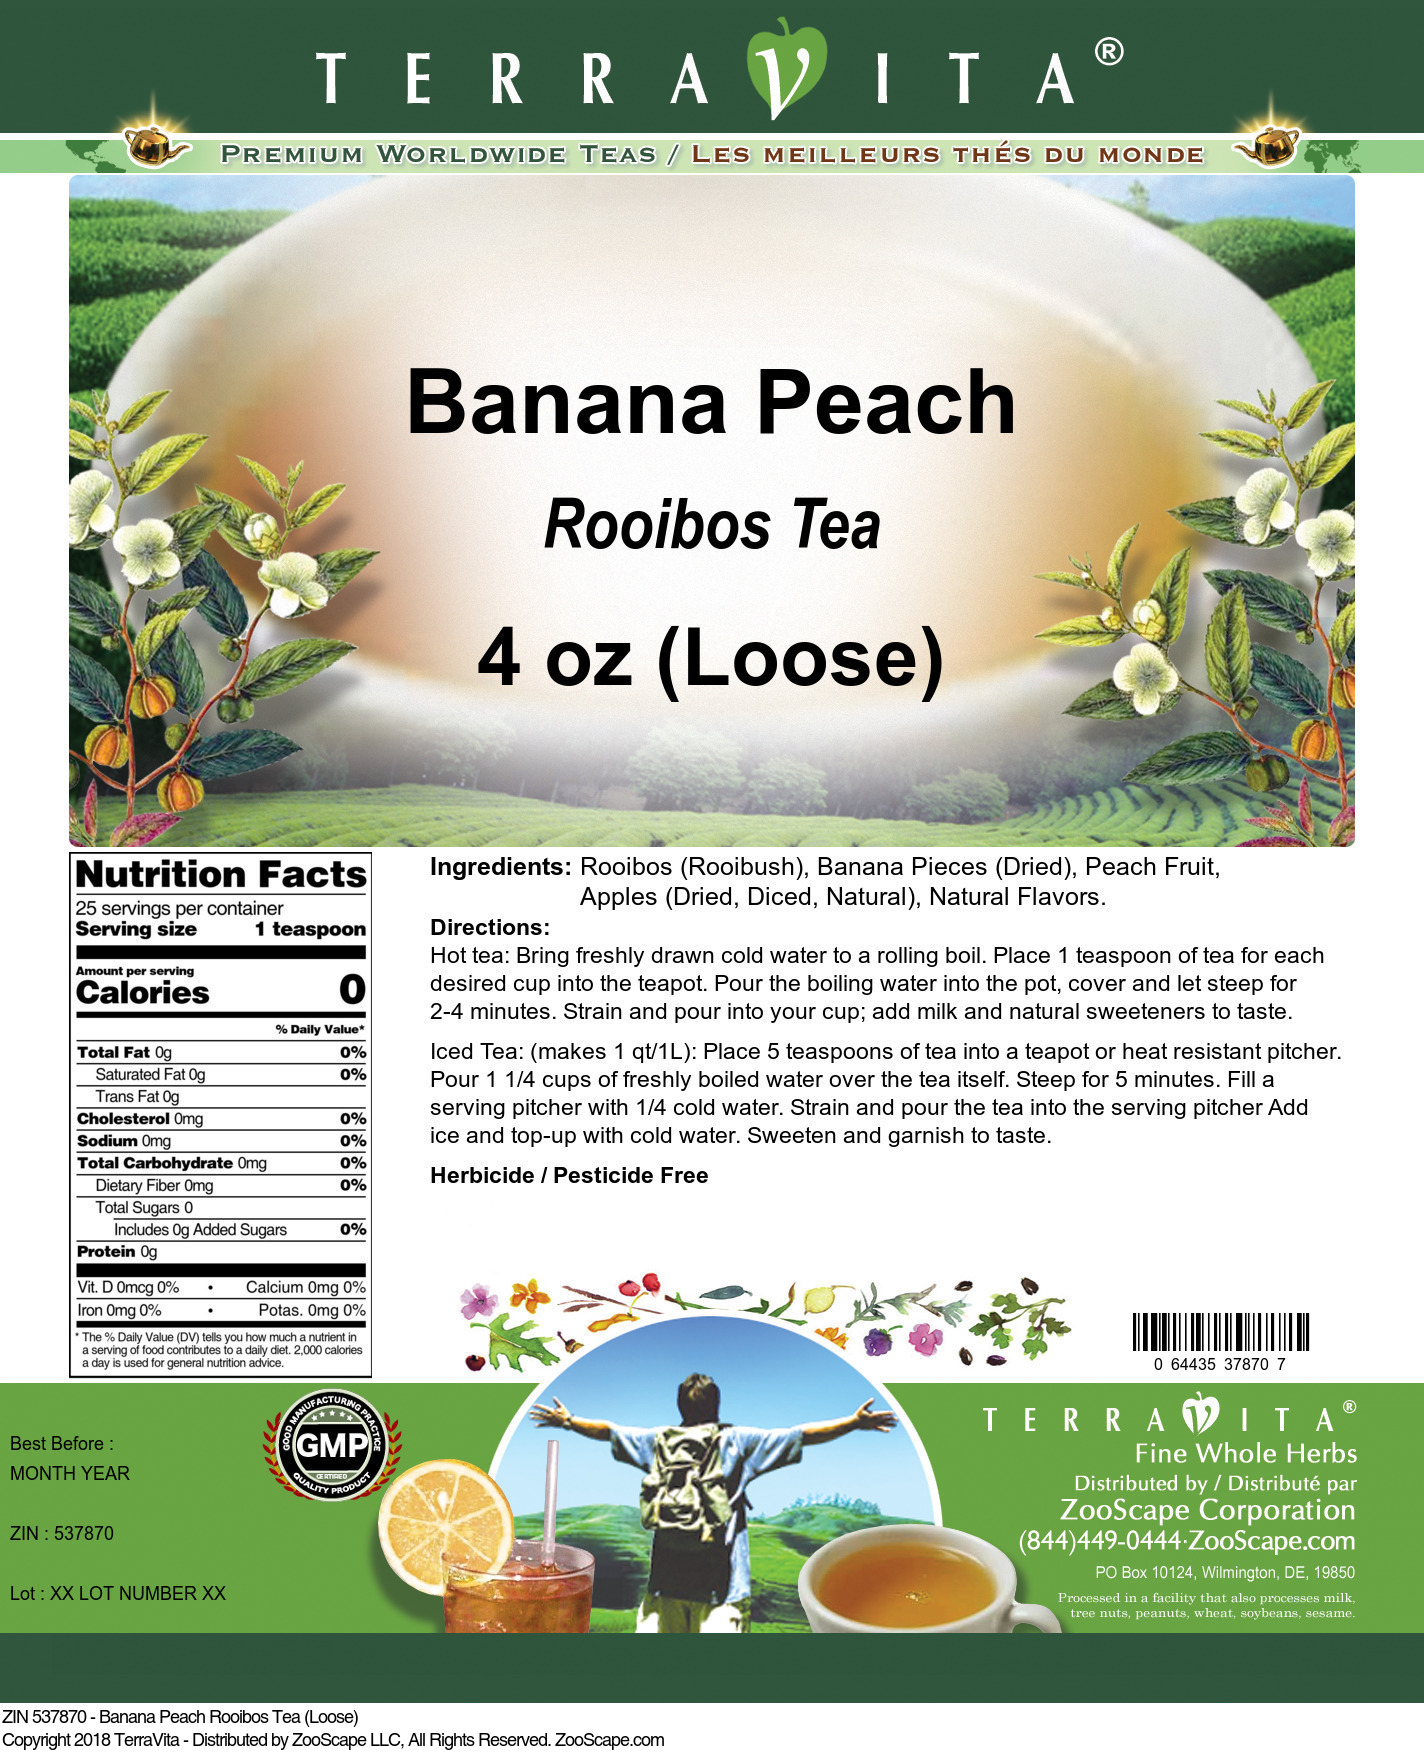 Banana Peach Rooibos Tea (Loose)